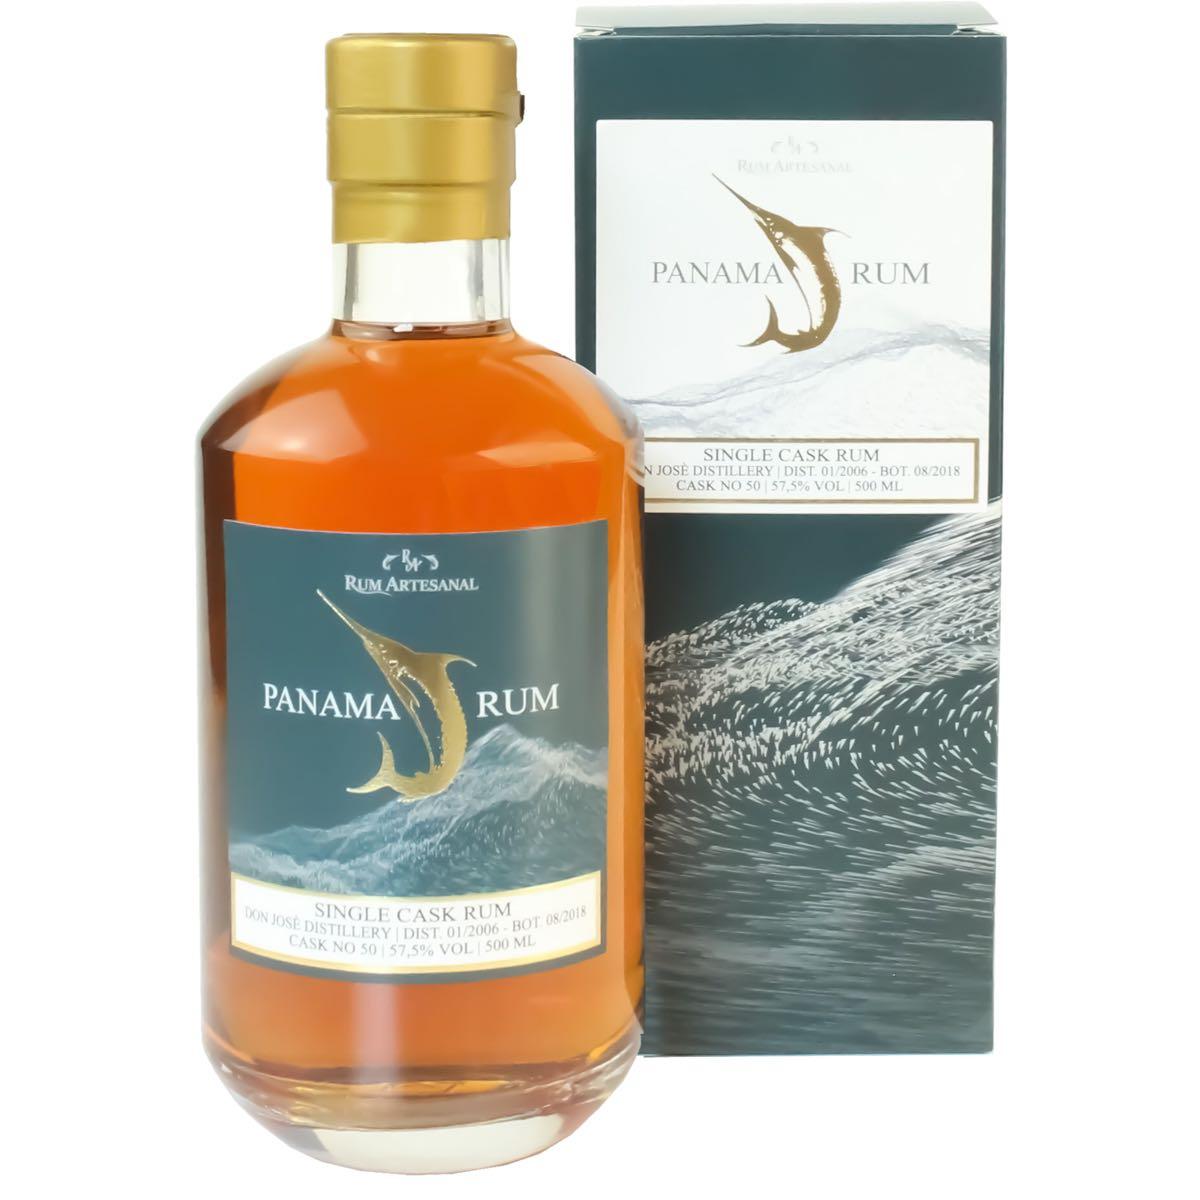 Bottle image of Rum Artesanal Panama Rum